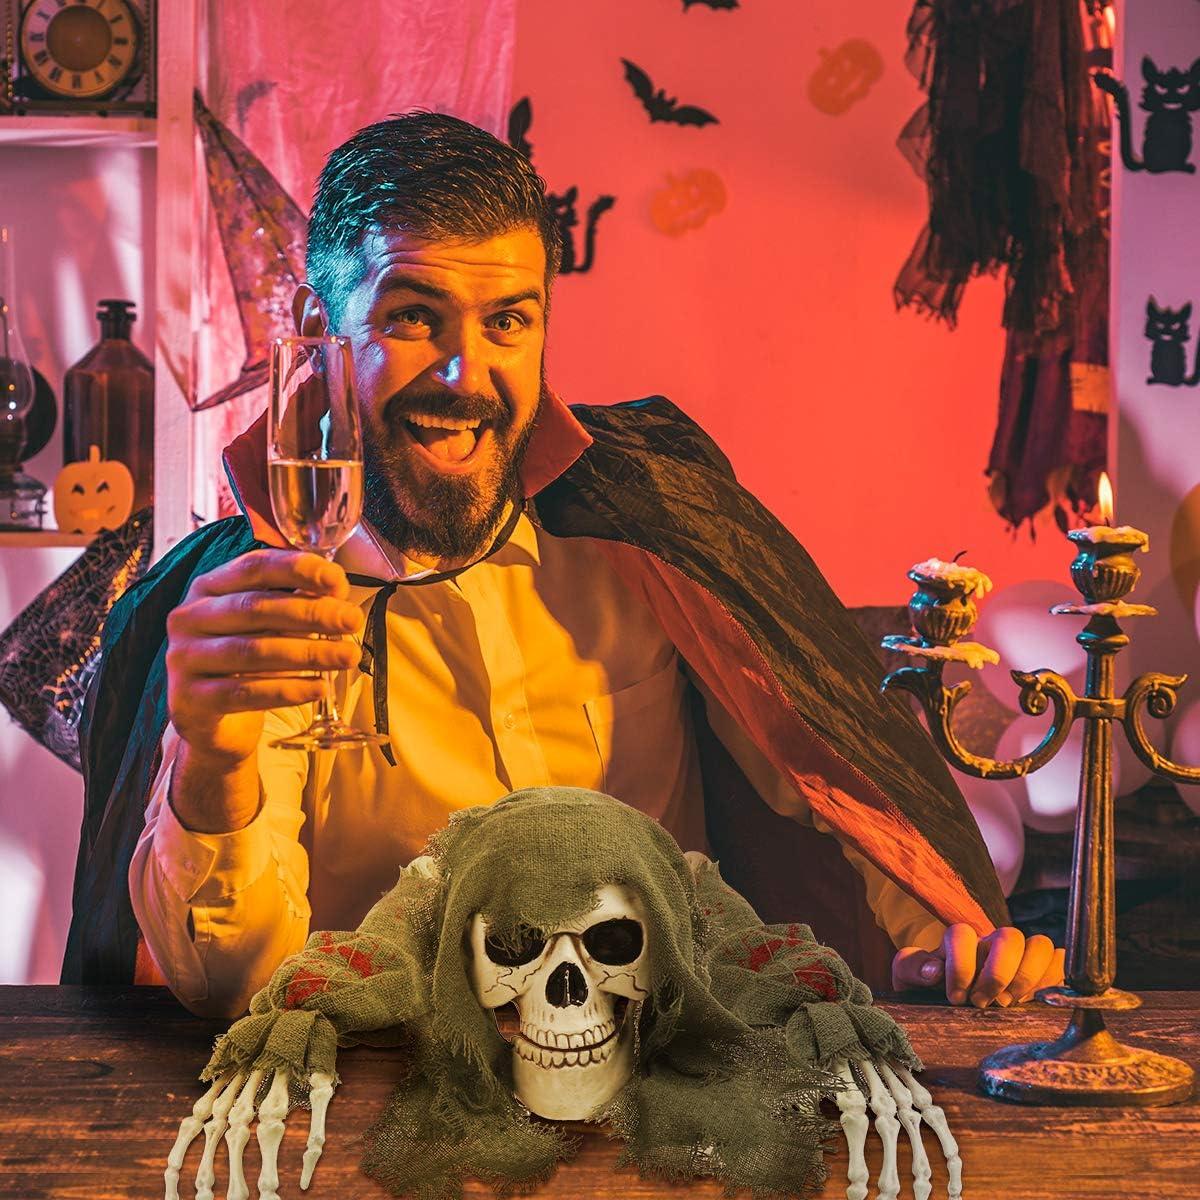 Halloween Decorations Outdoor Skeleton Skull Stakes Decorations Ground Breaker Skeleton Best Halloween Decorations